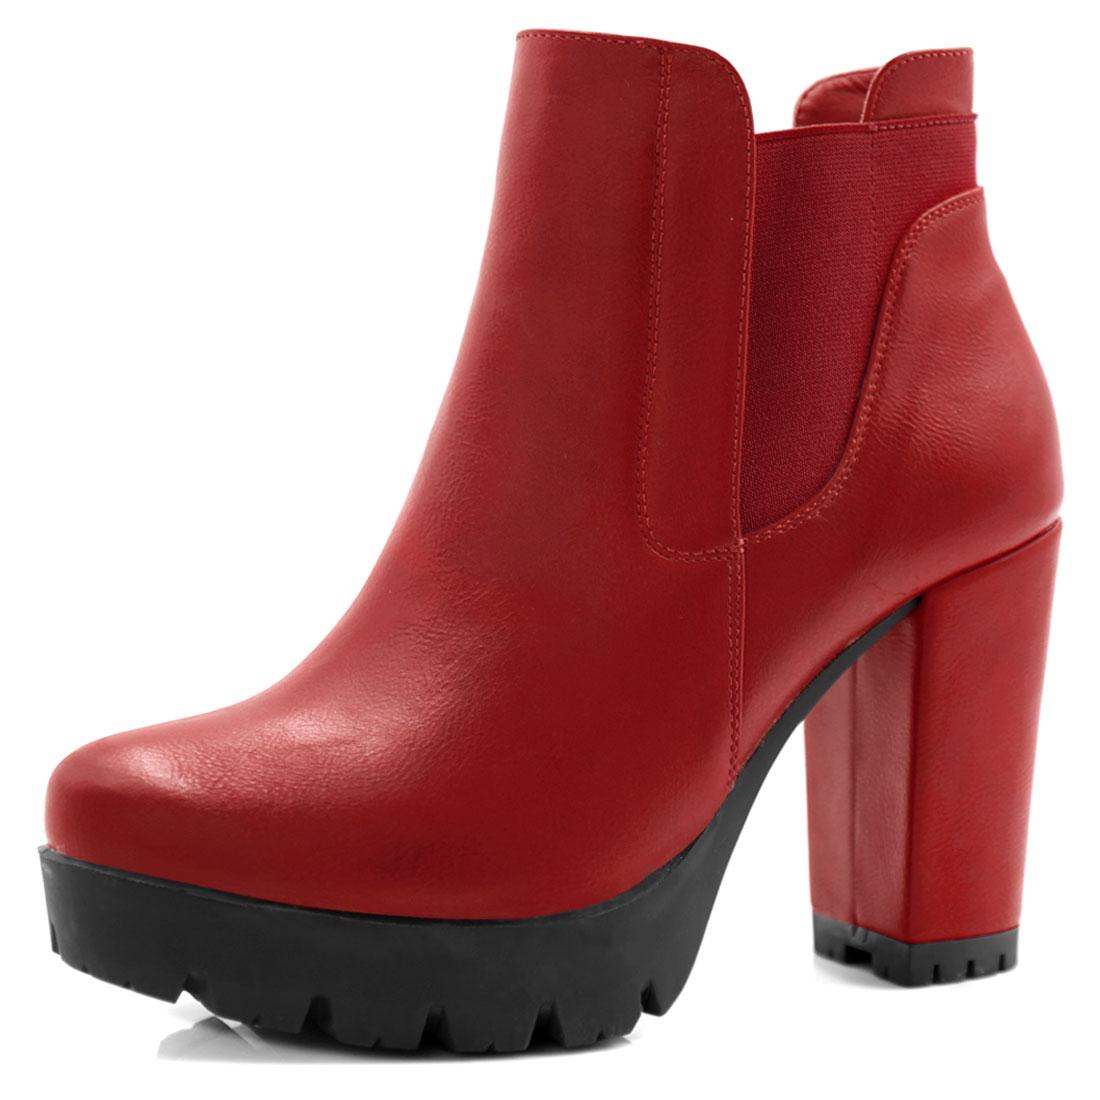 Allegra K Women Chunky High Heel Platform Zipper Chelsea Boots Red US 7